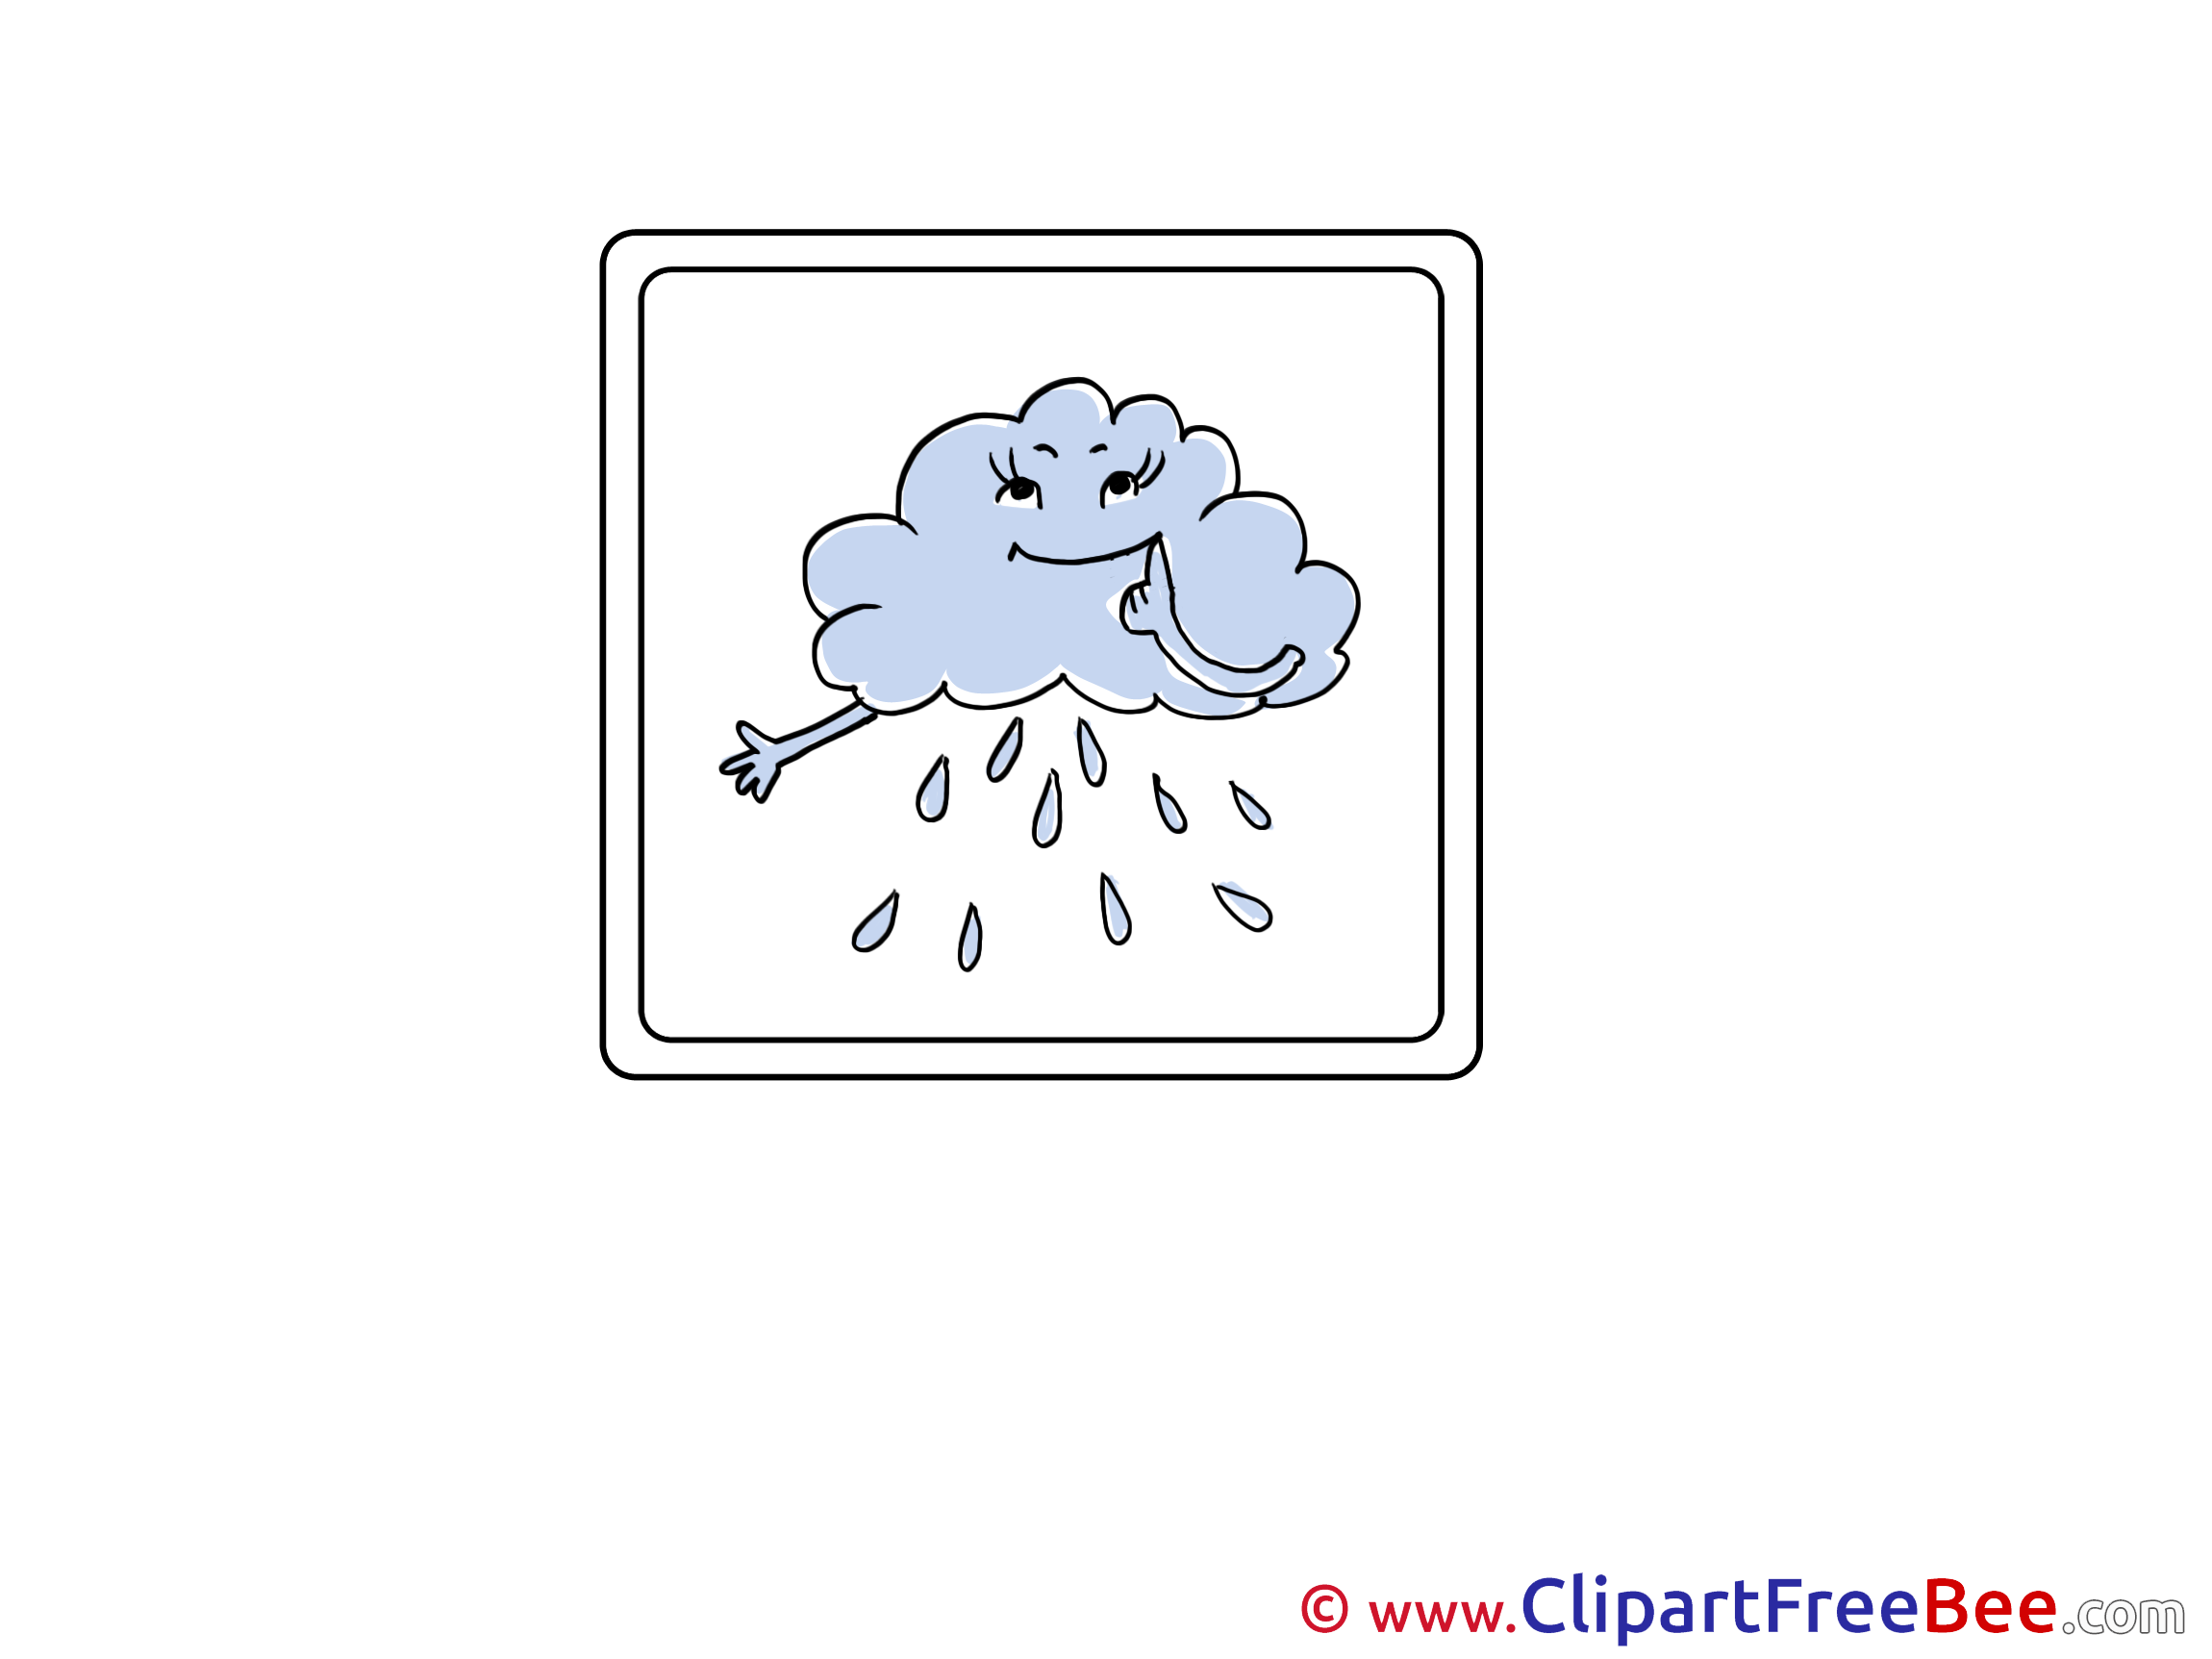 Rain Cloud Clip Art download for free